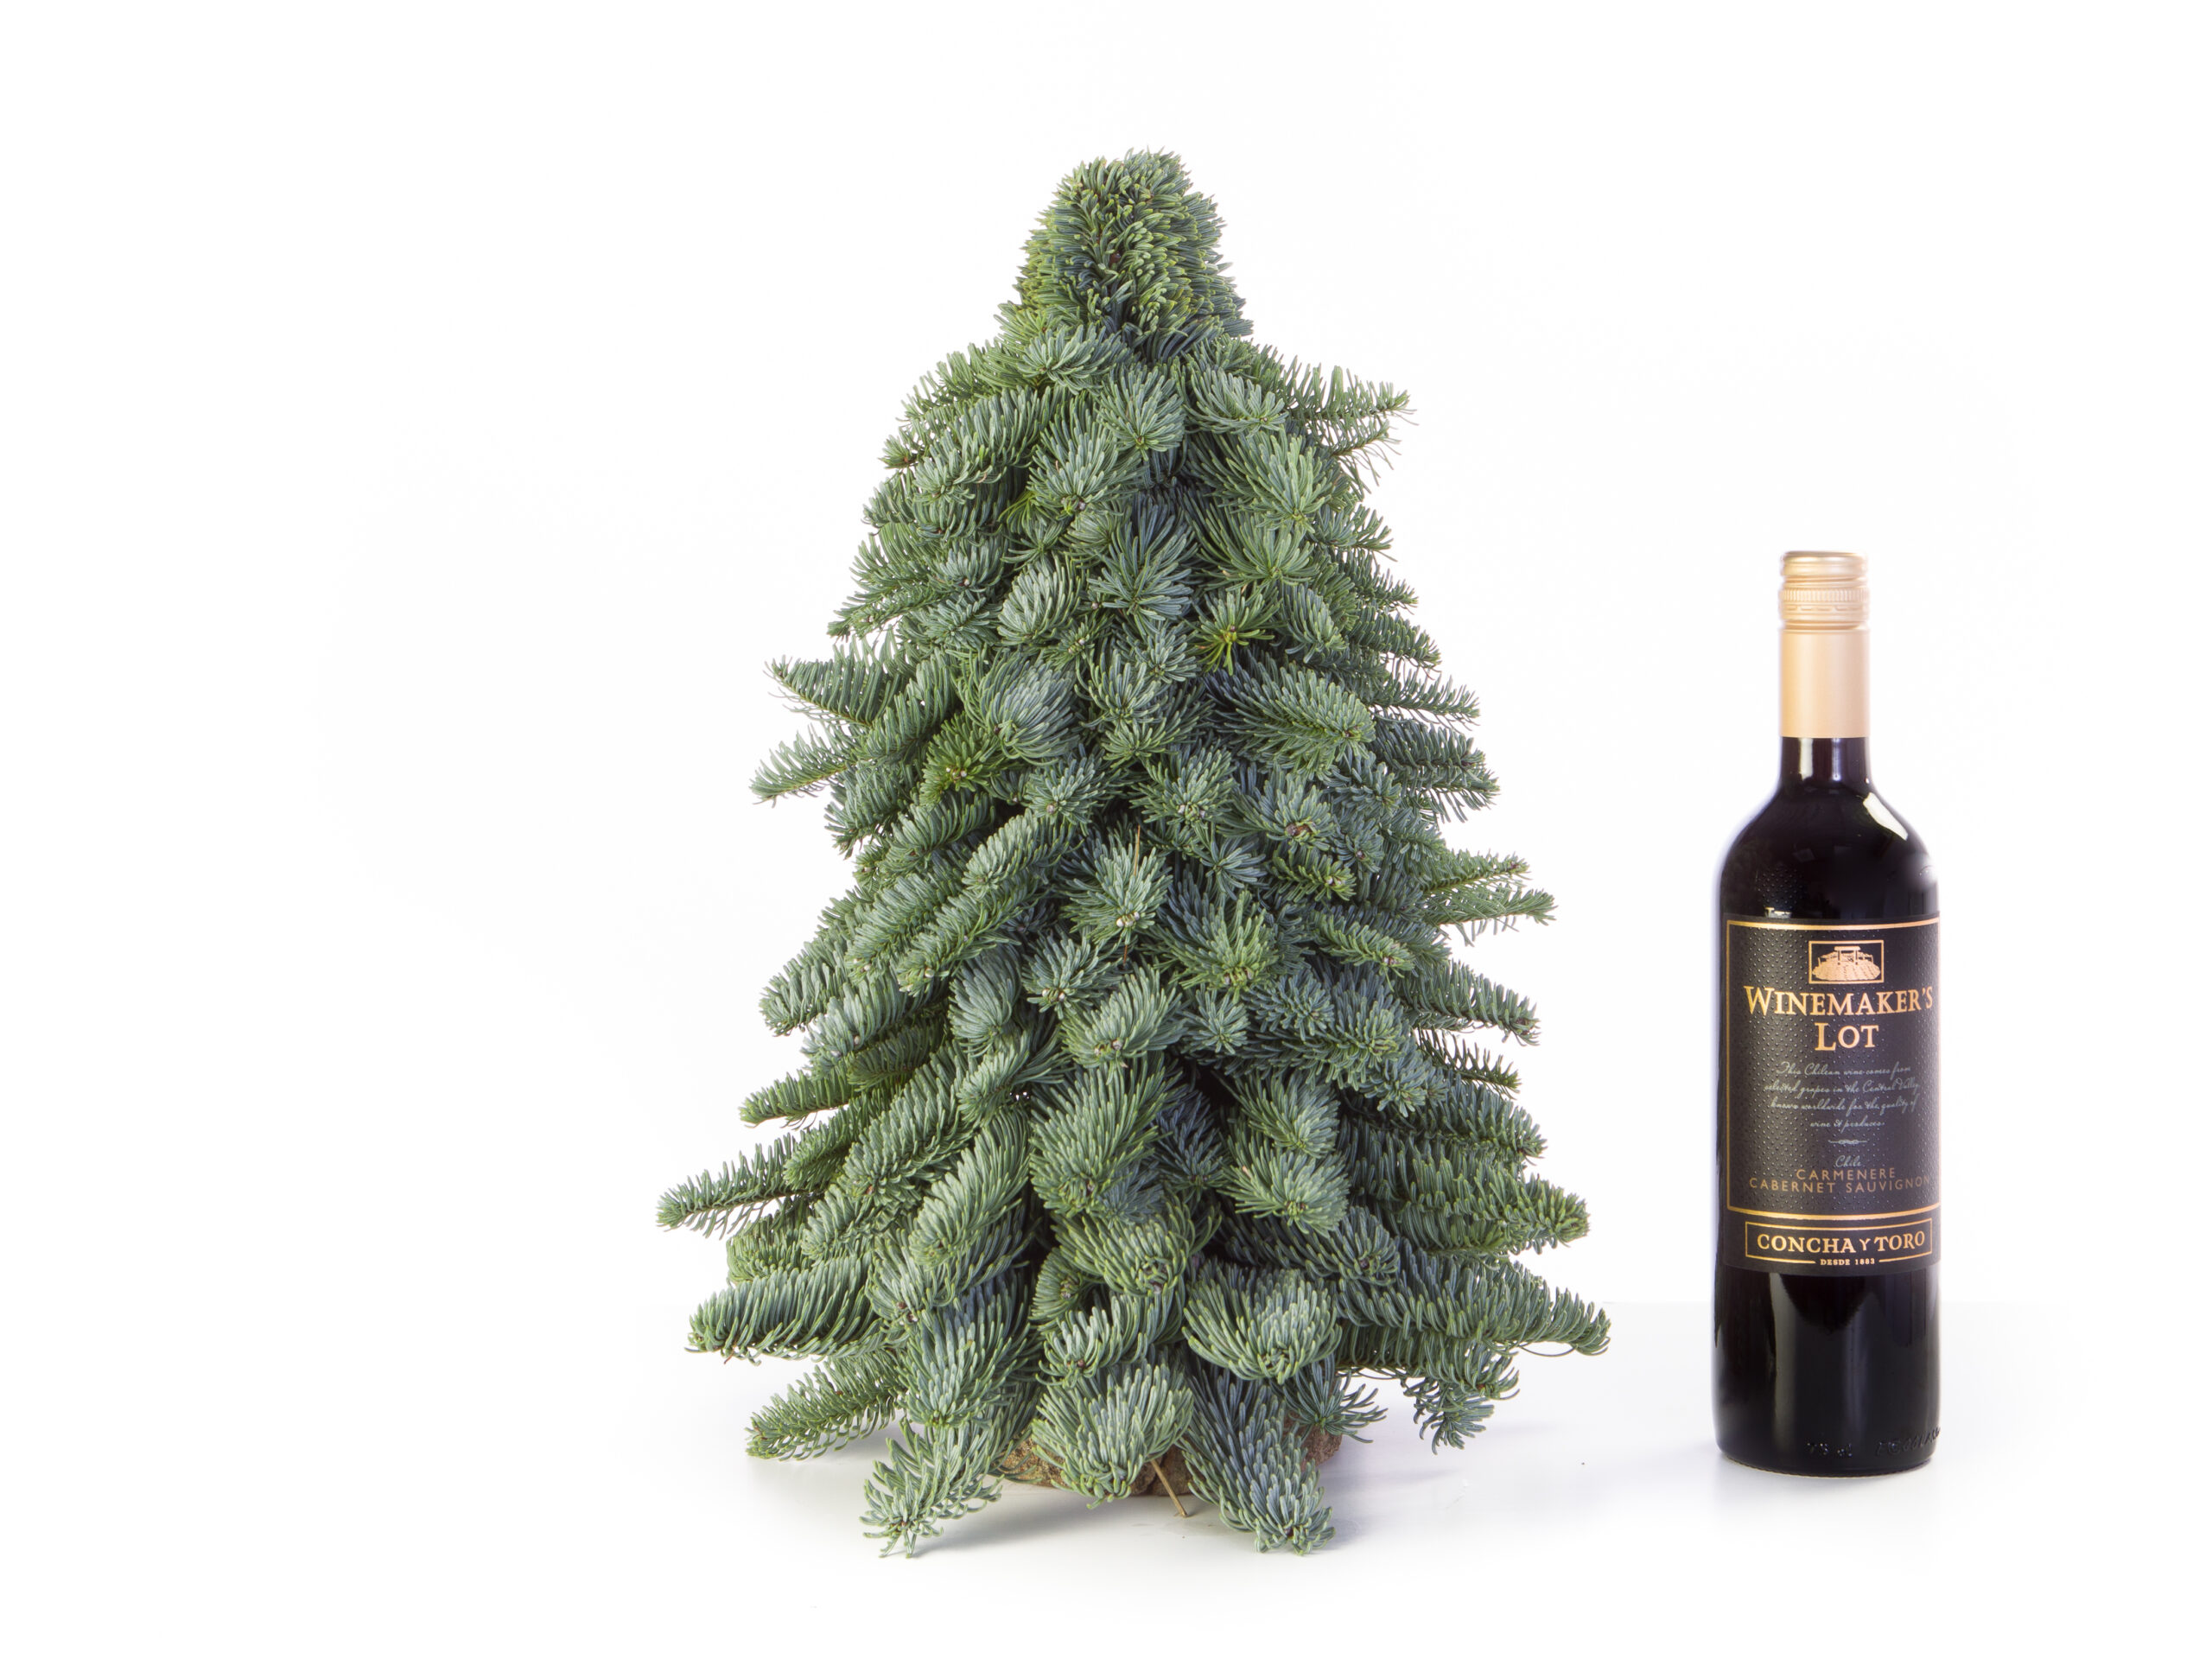 Klein kerstboompje kopen